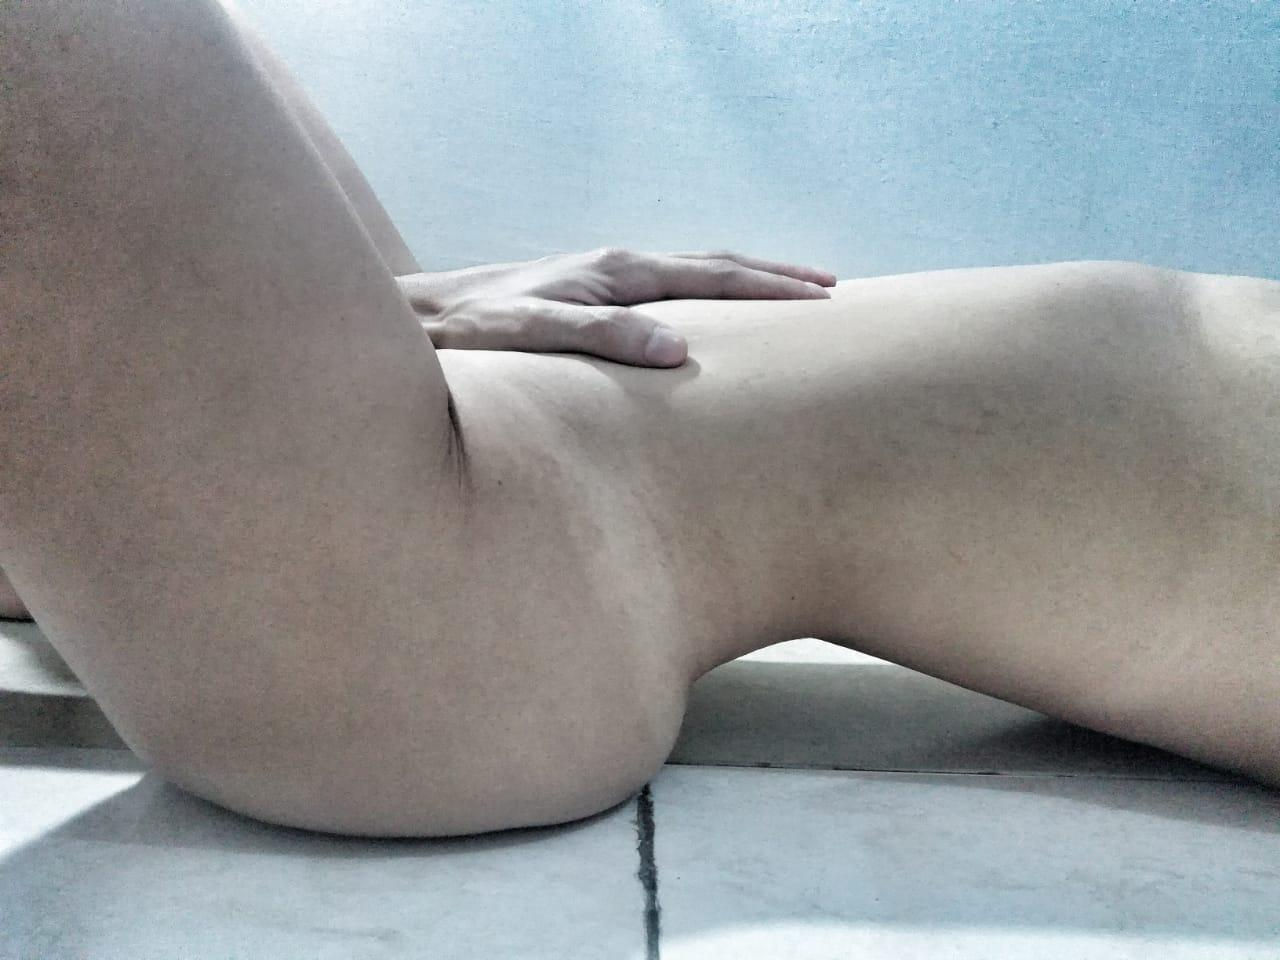 Sex horny?s=thwb6gzj7si9+6ppybpcbcrtx8qktk7j4cseywu9bn0=